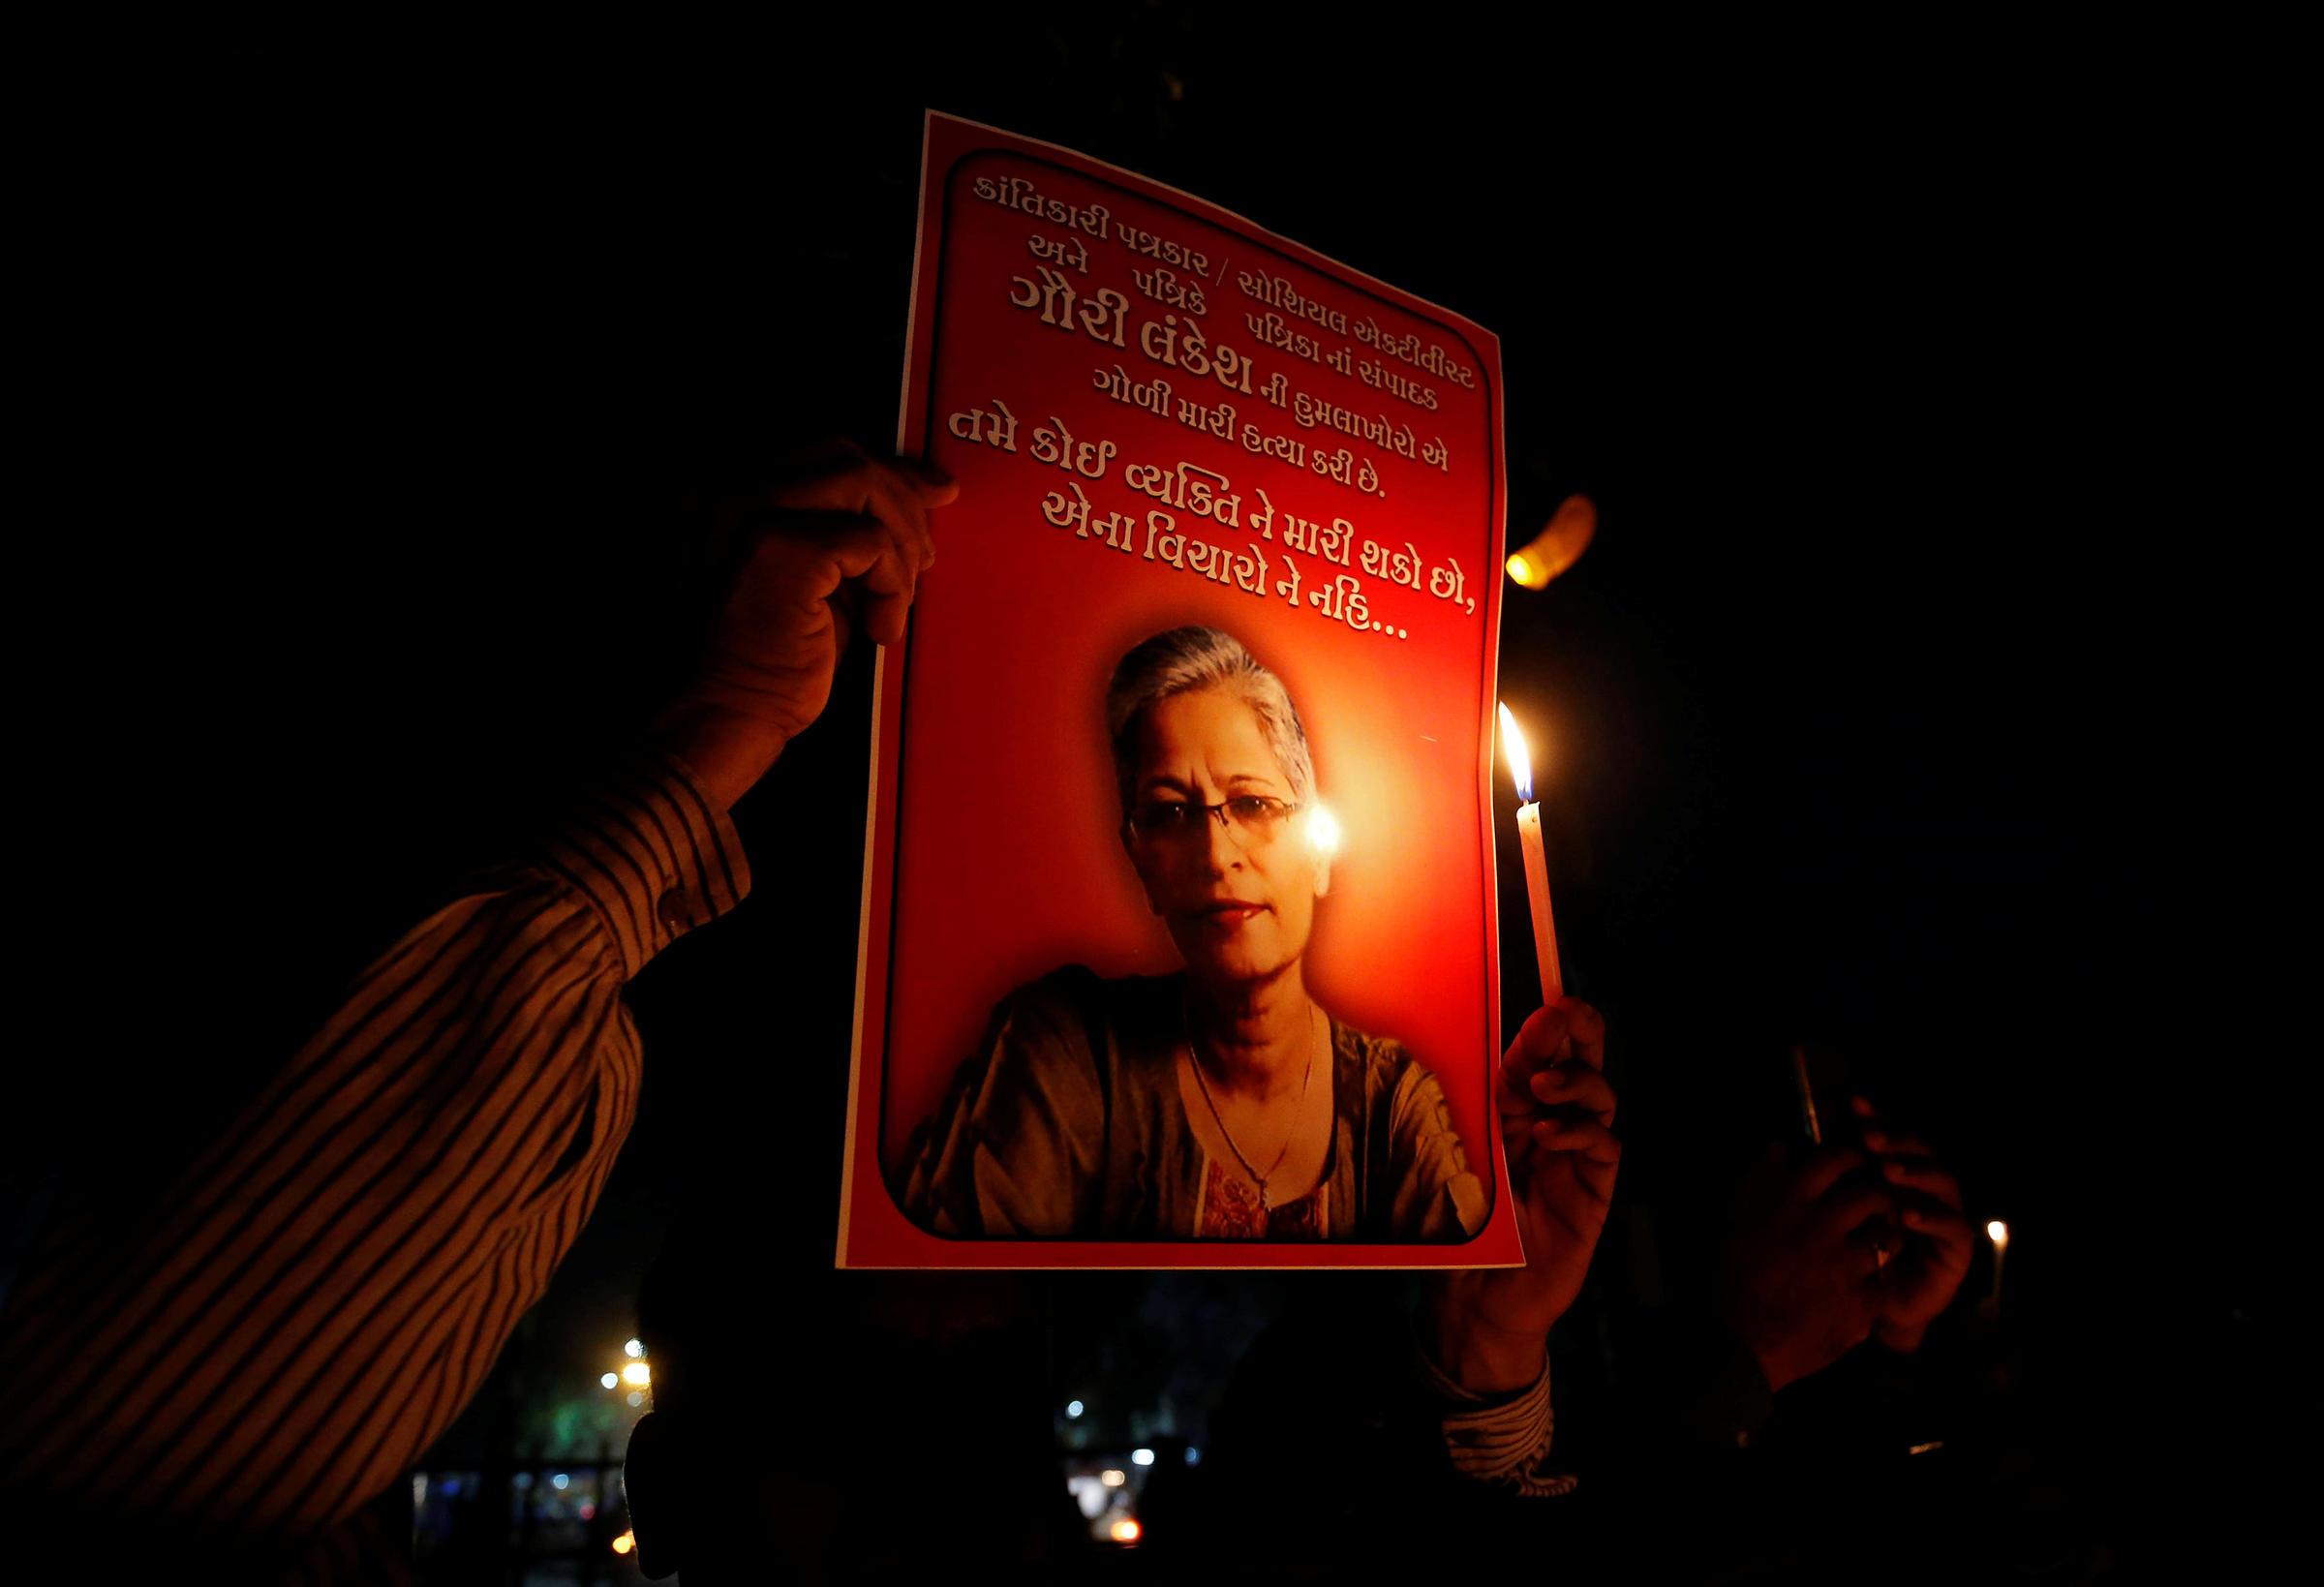 U.S. condemns killing of journalist Gauri Lankesh